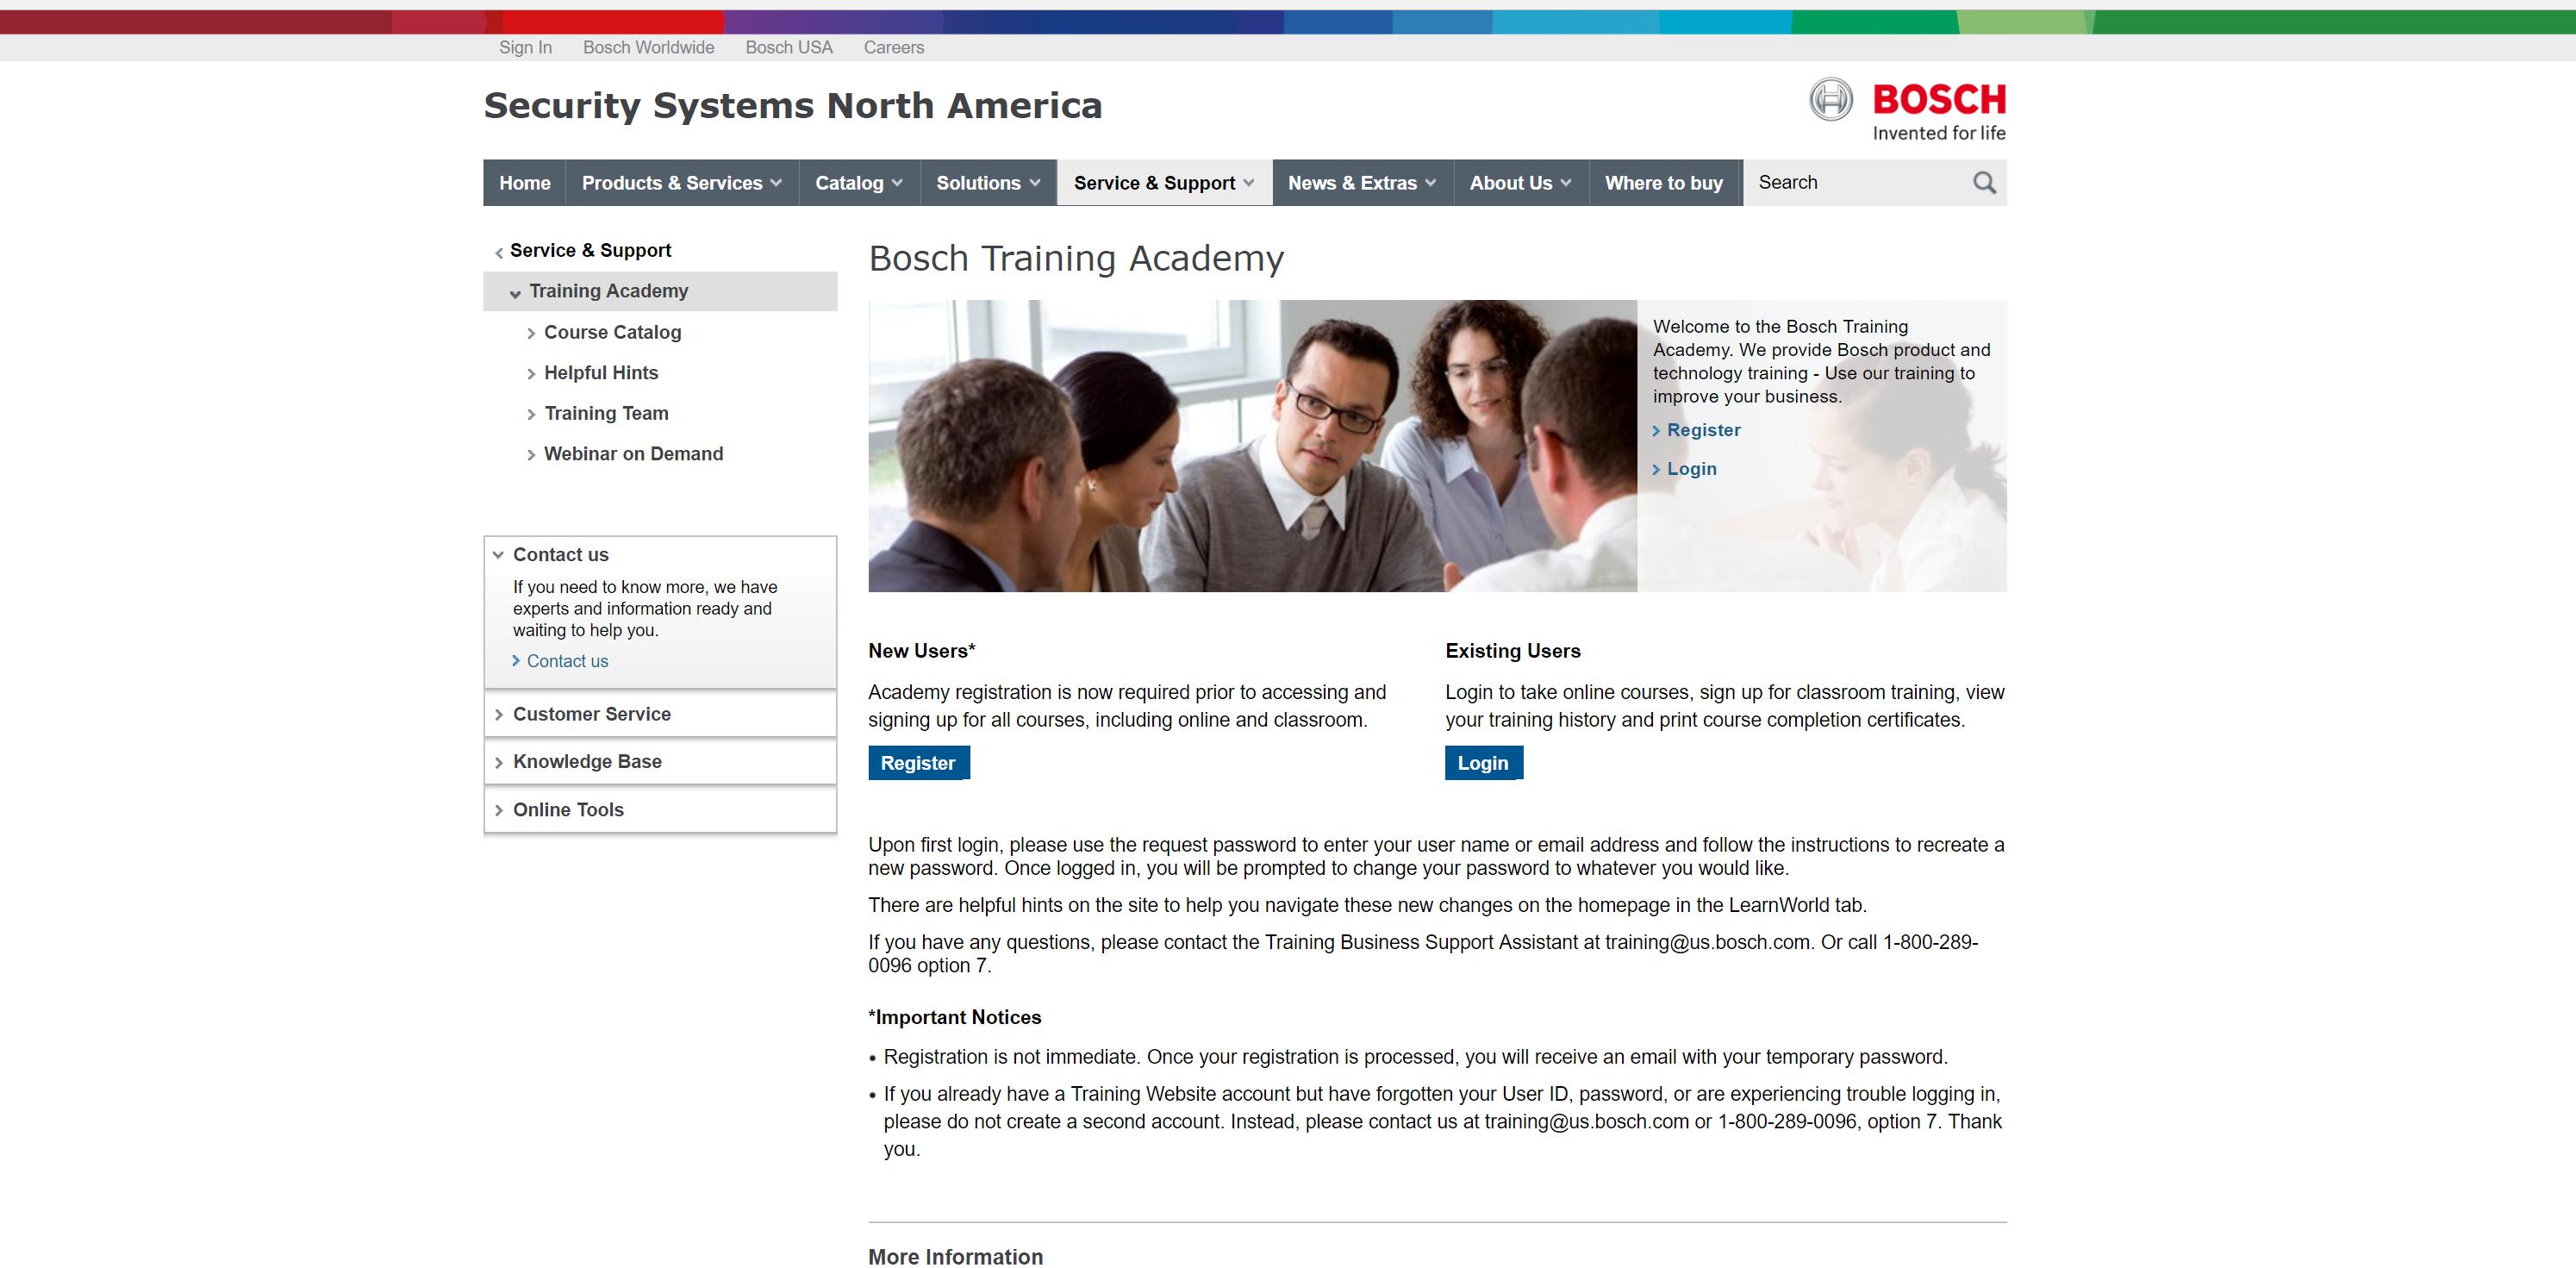 Bosch Training Academy website image.png